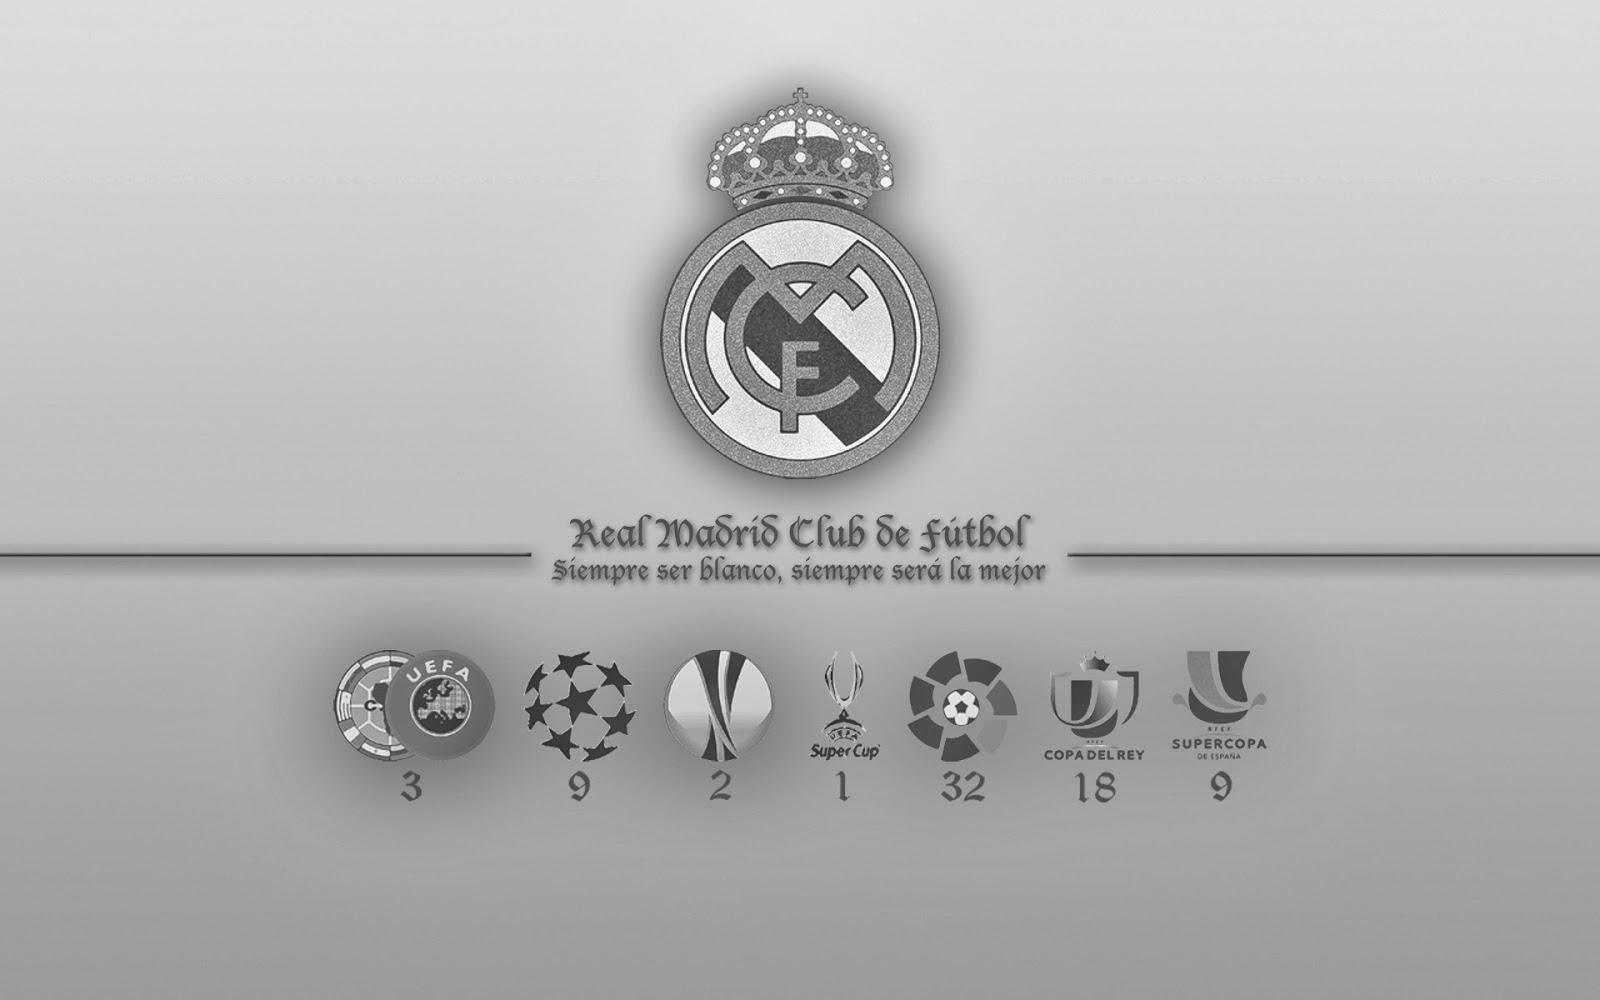 Fondos de futbol real madrid